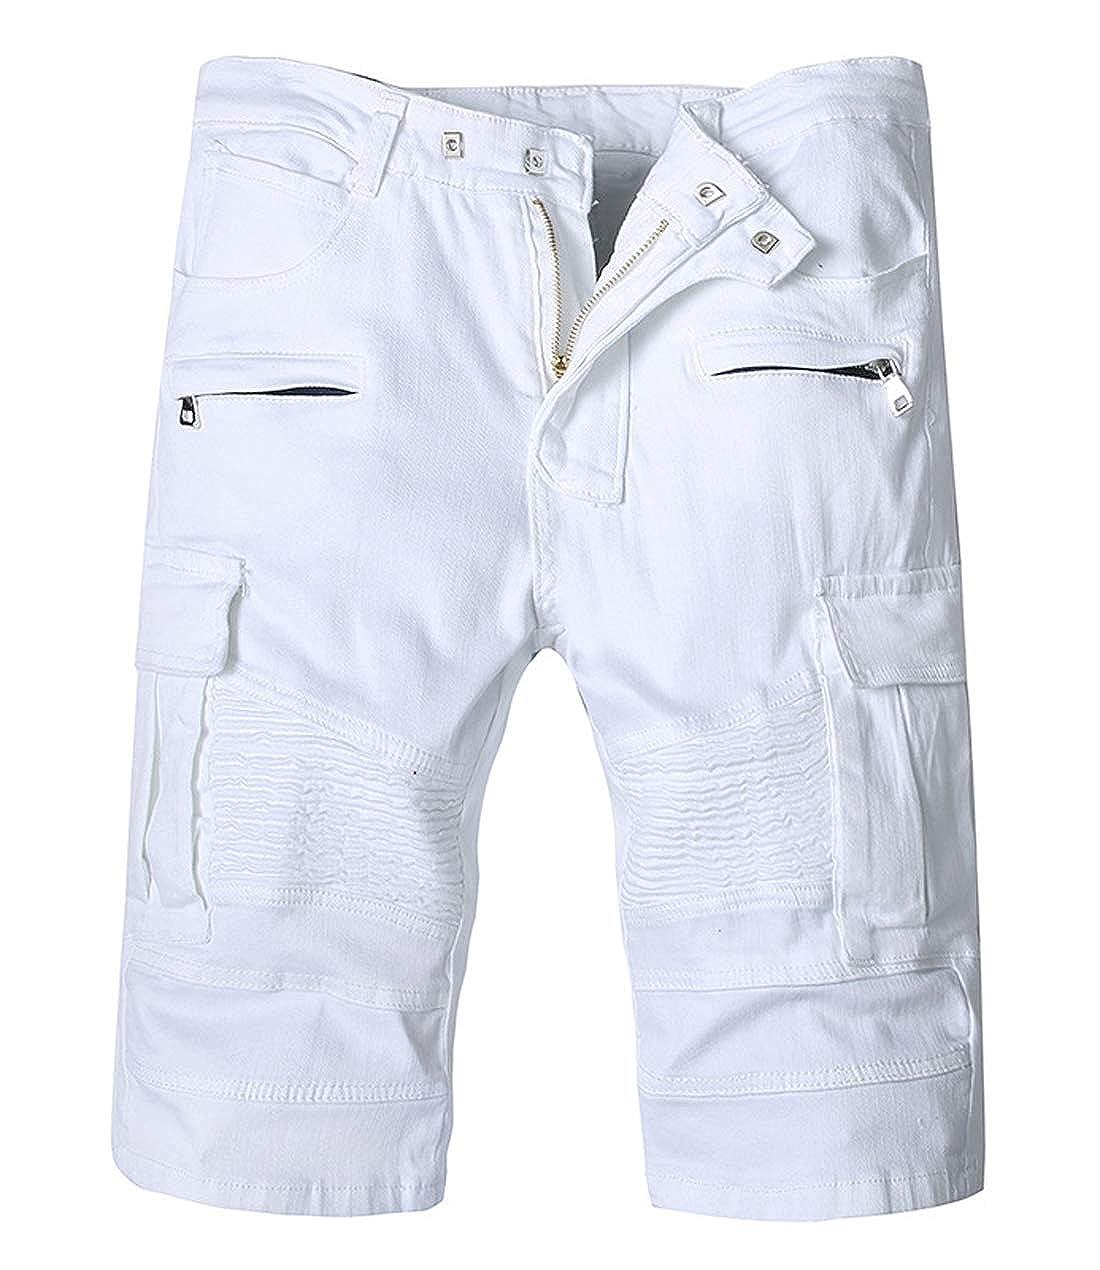 chouyatou Mens Slim-Fit Cargo Pocket Ruffled Knee Biker Jean Shorts Denim Short Pants